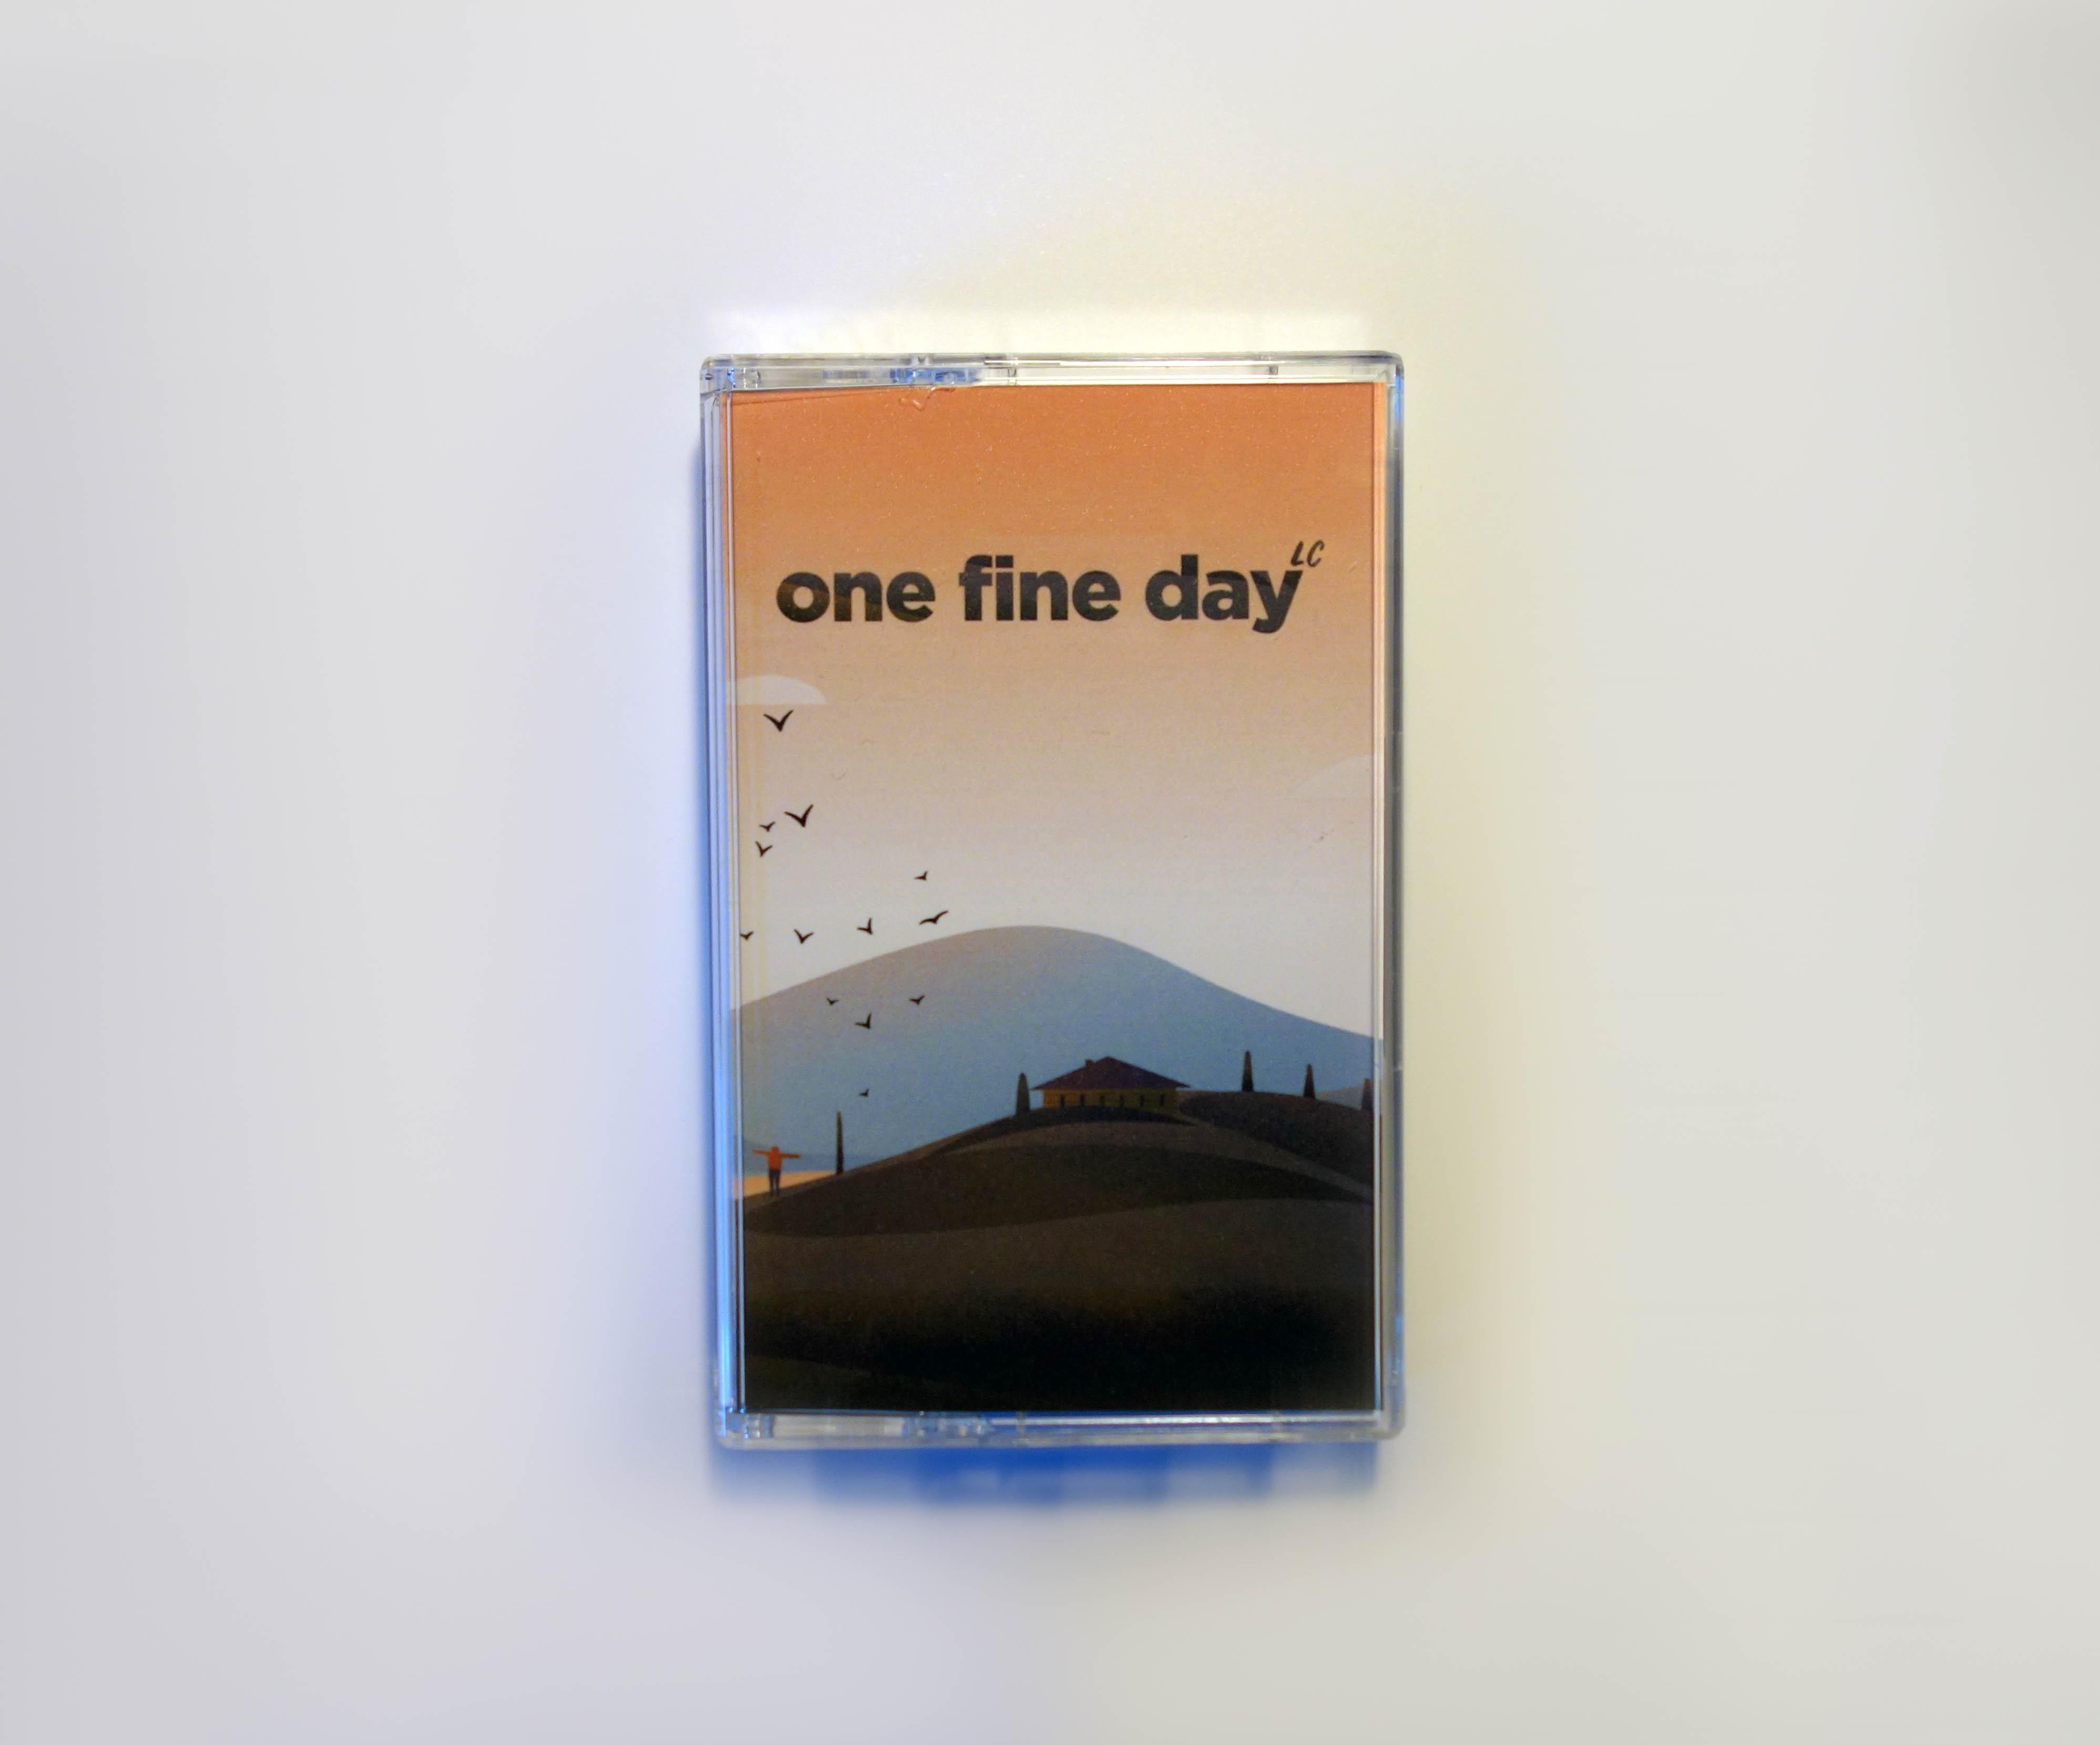 Onefineday 2